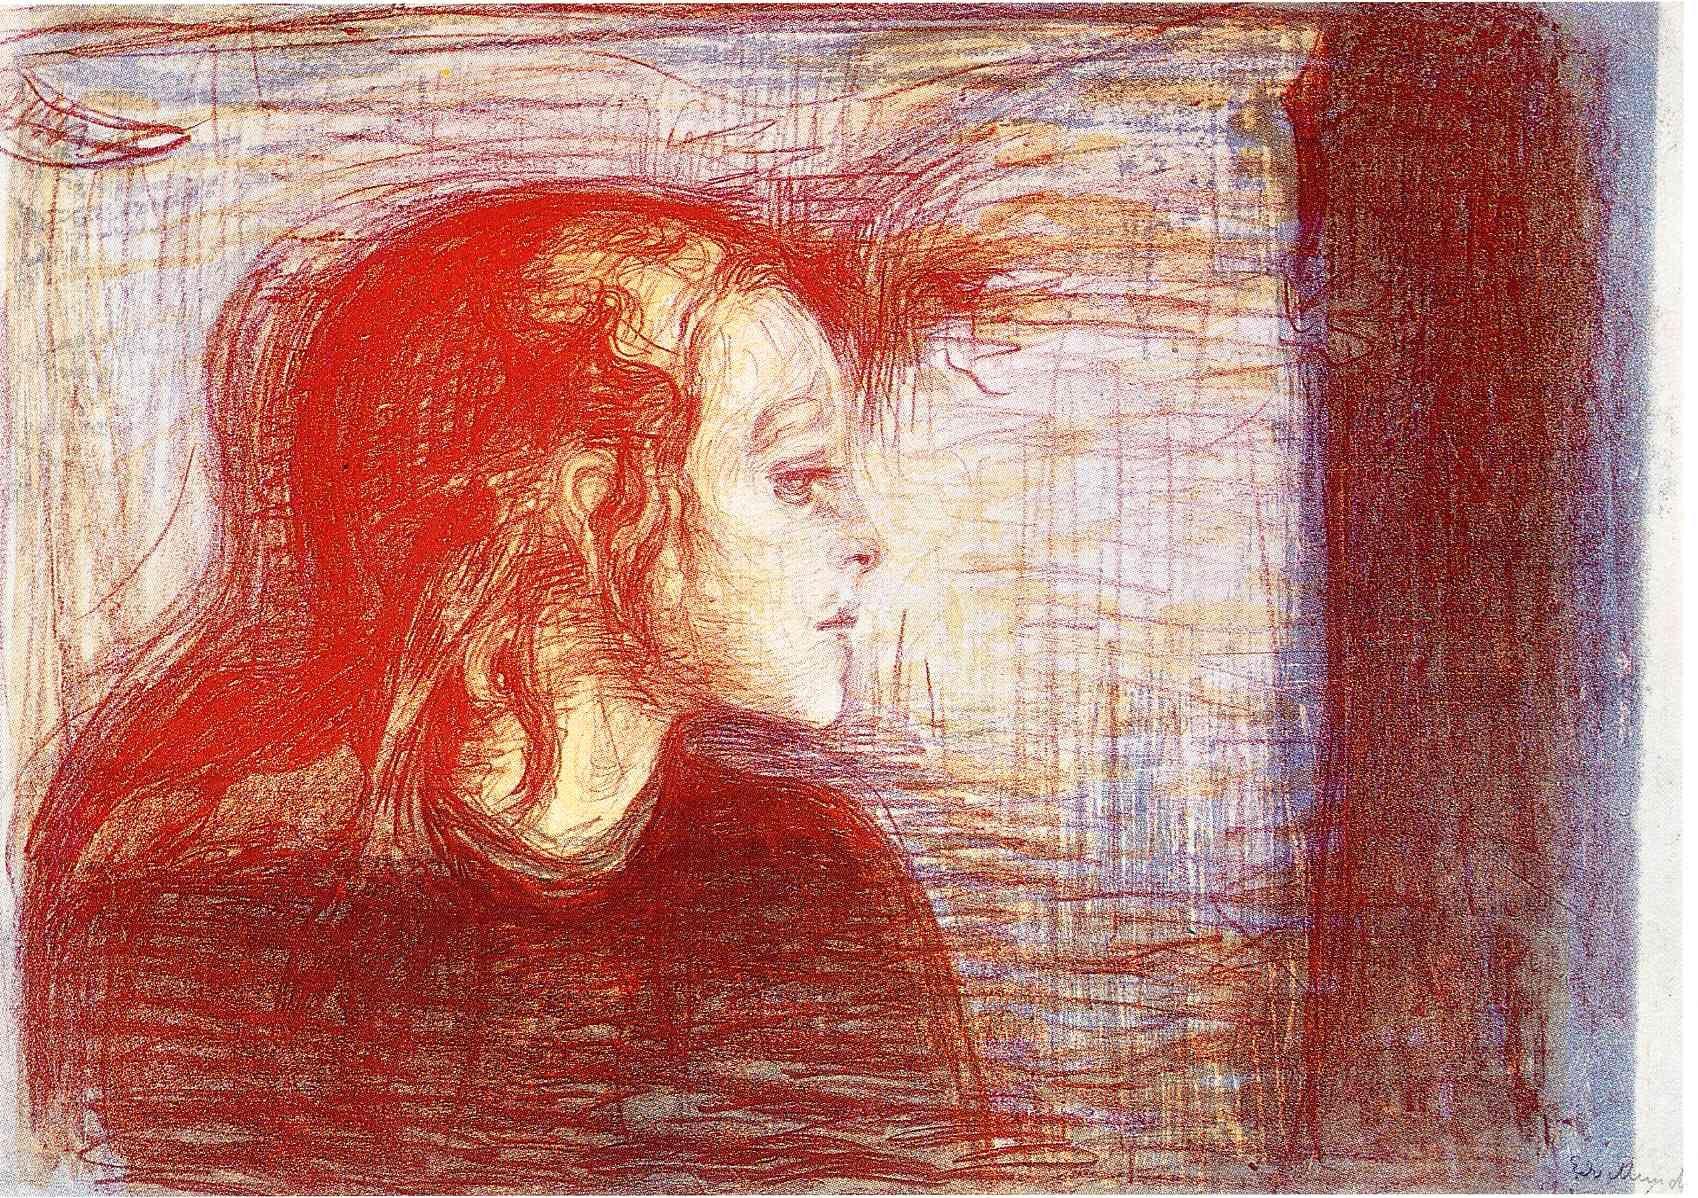 The Sick Child II - Edvard Munch - WikiArt.org | Edvard munch, Painting, Art